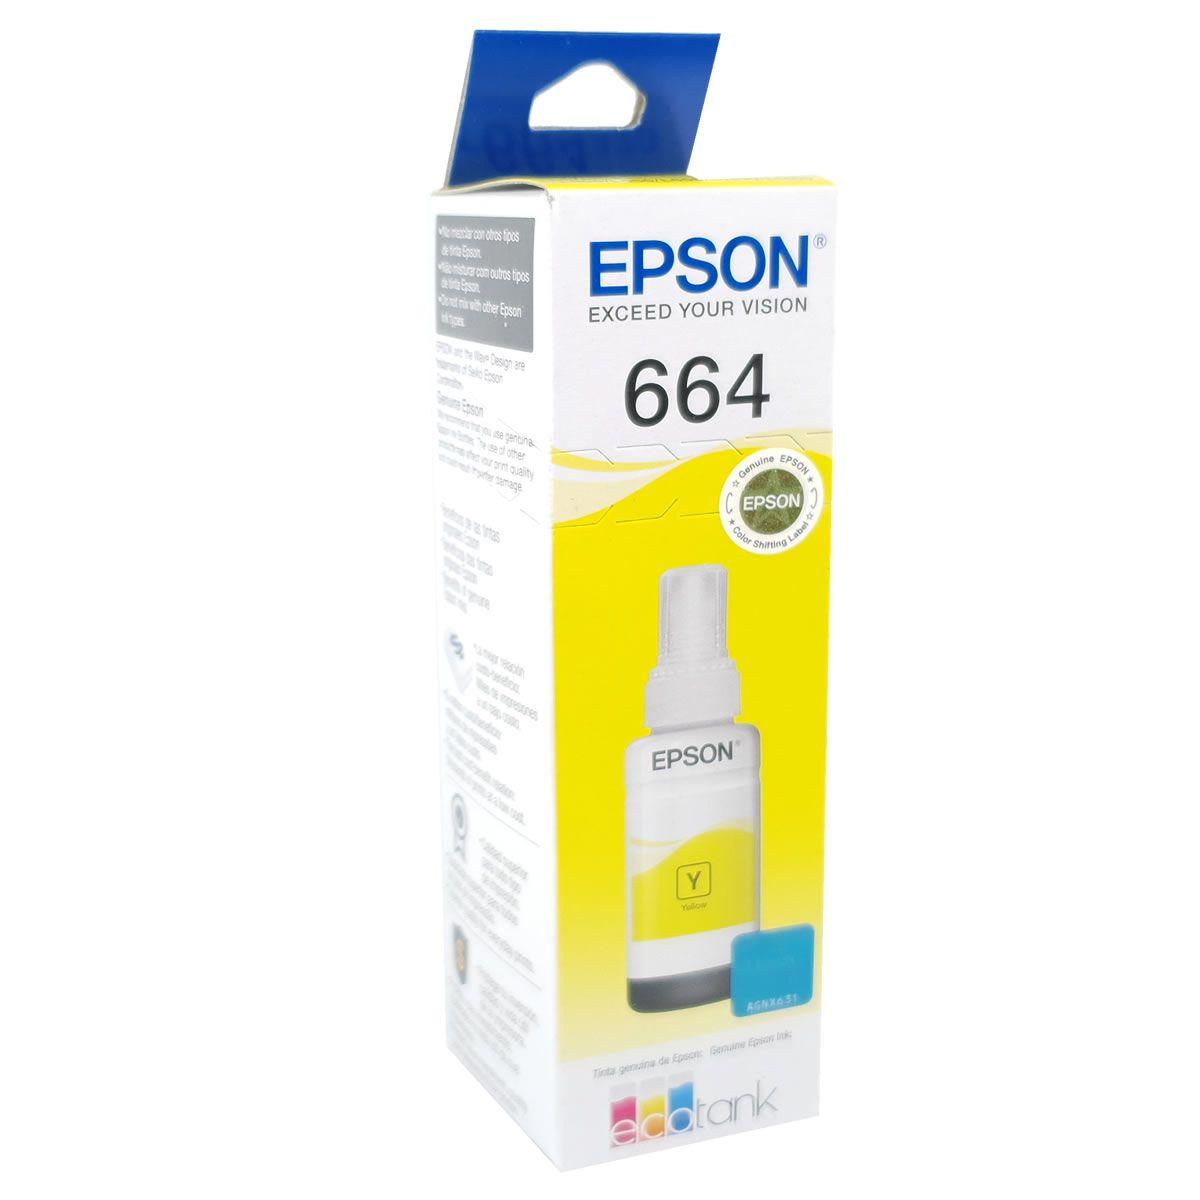 Refil de Tinta EPSON 664 Amarelo 70ml para ecotank L355 L375 L395 L455